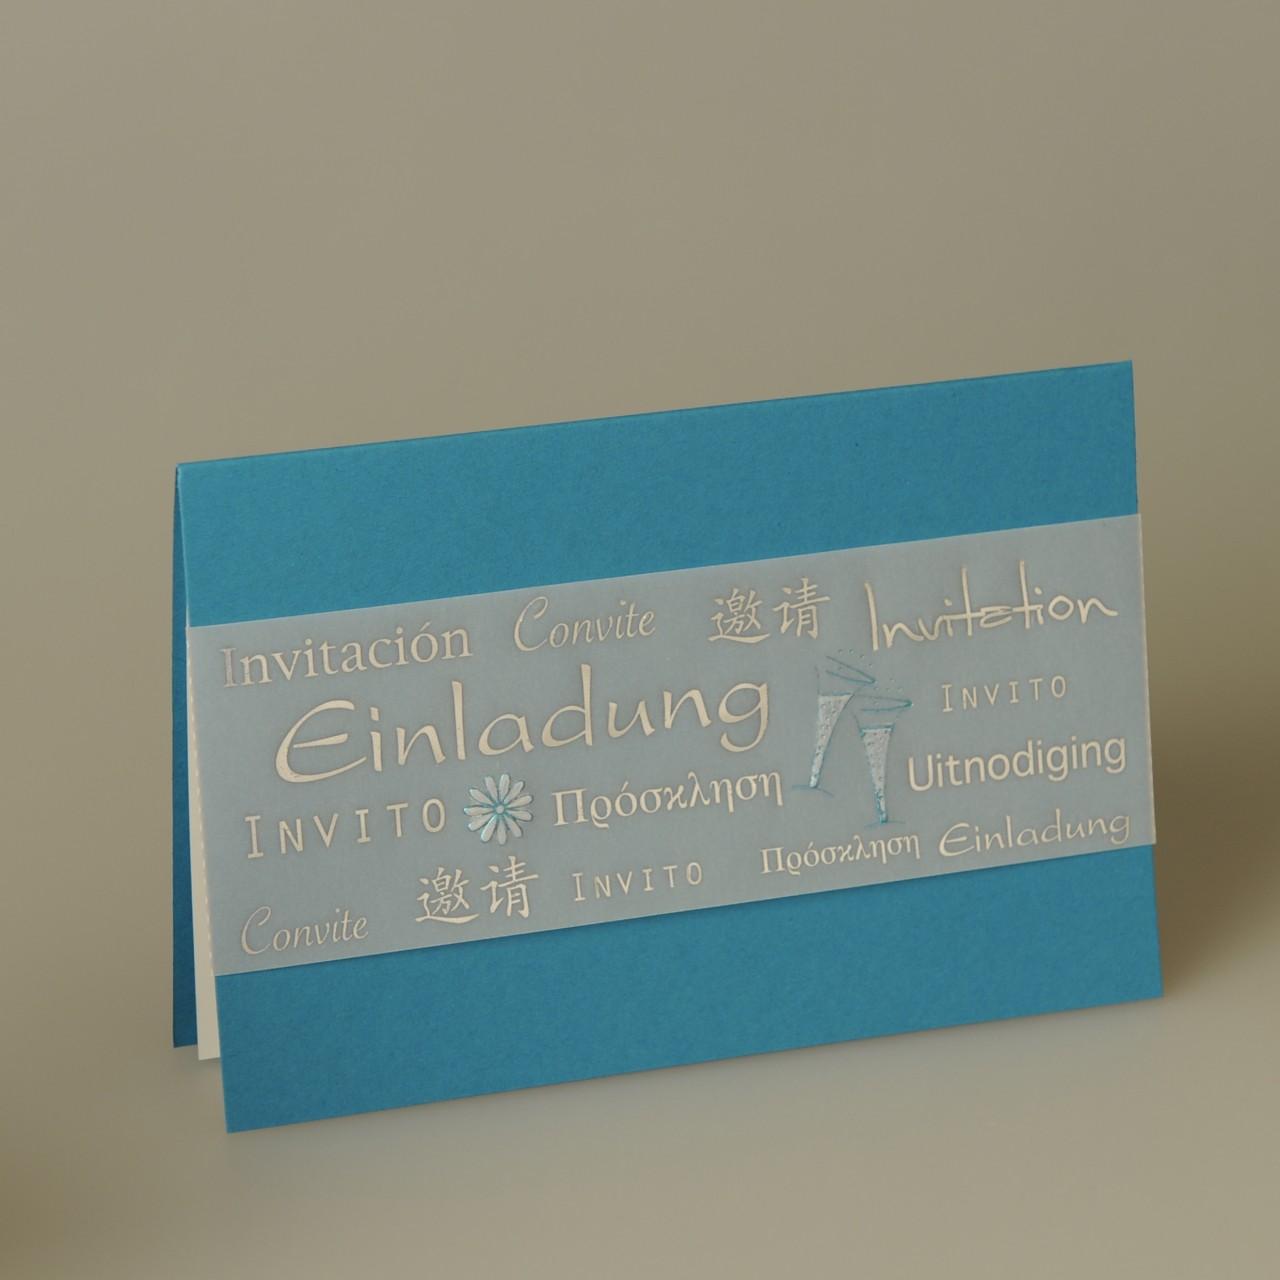 Einladungskarte - A 1992